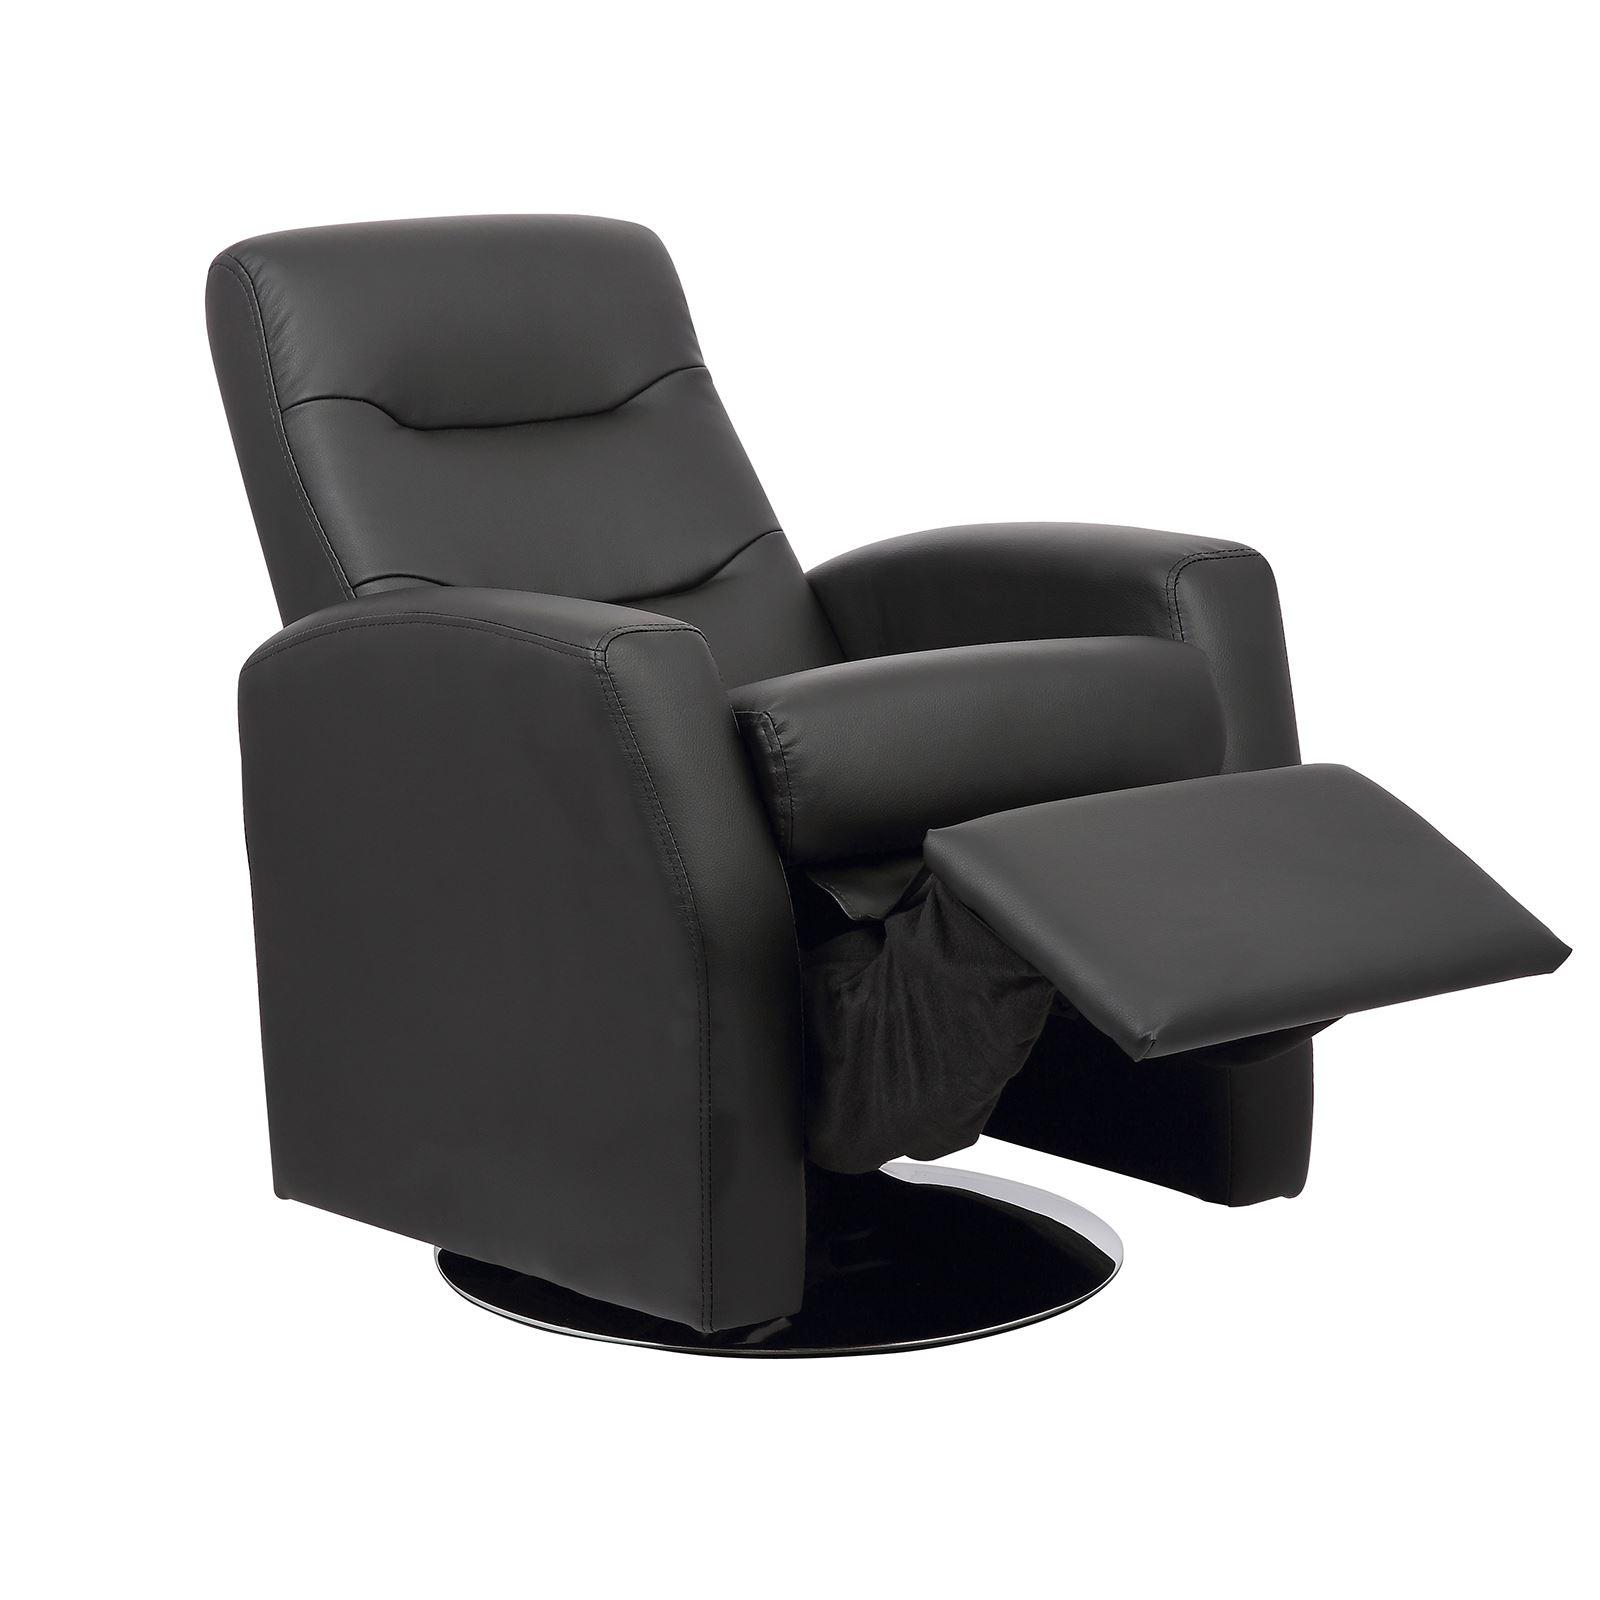 Luxury Kids Reclining Swivel Chair Childrens Comfortable ...